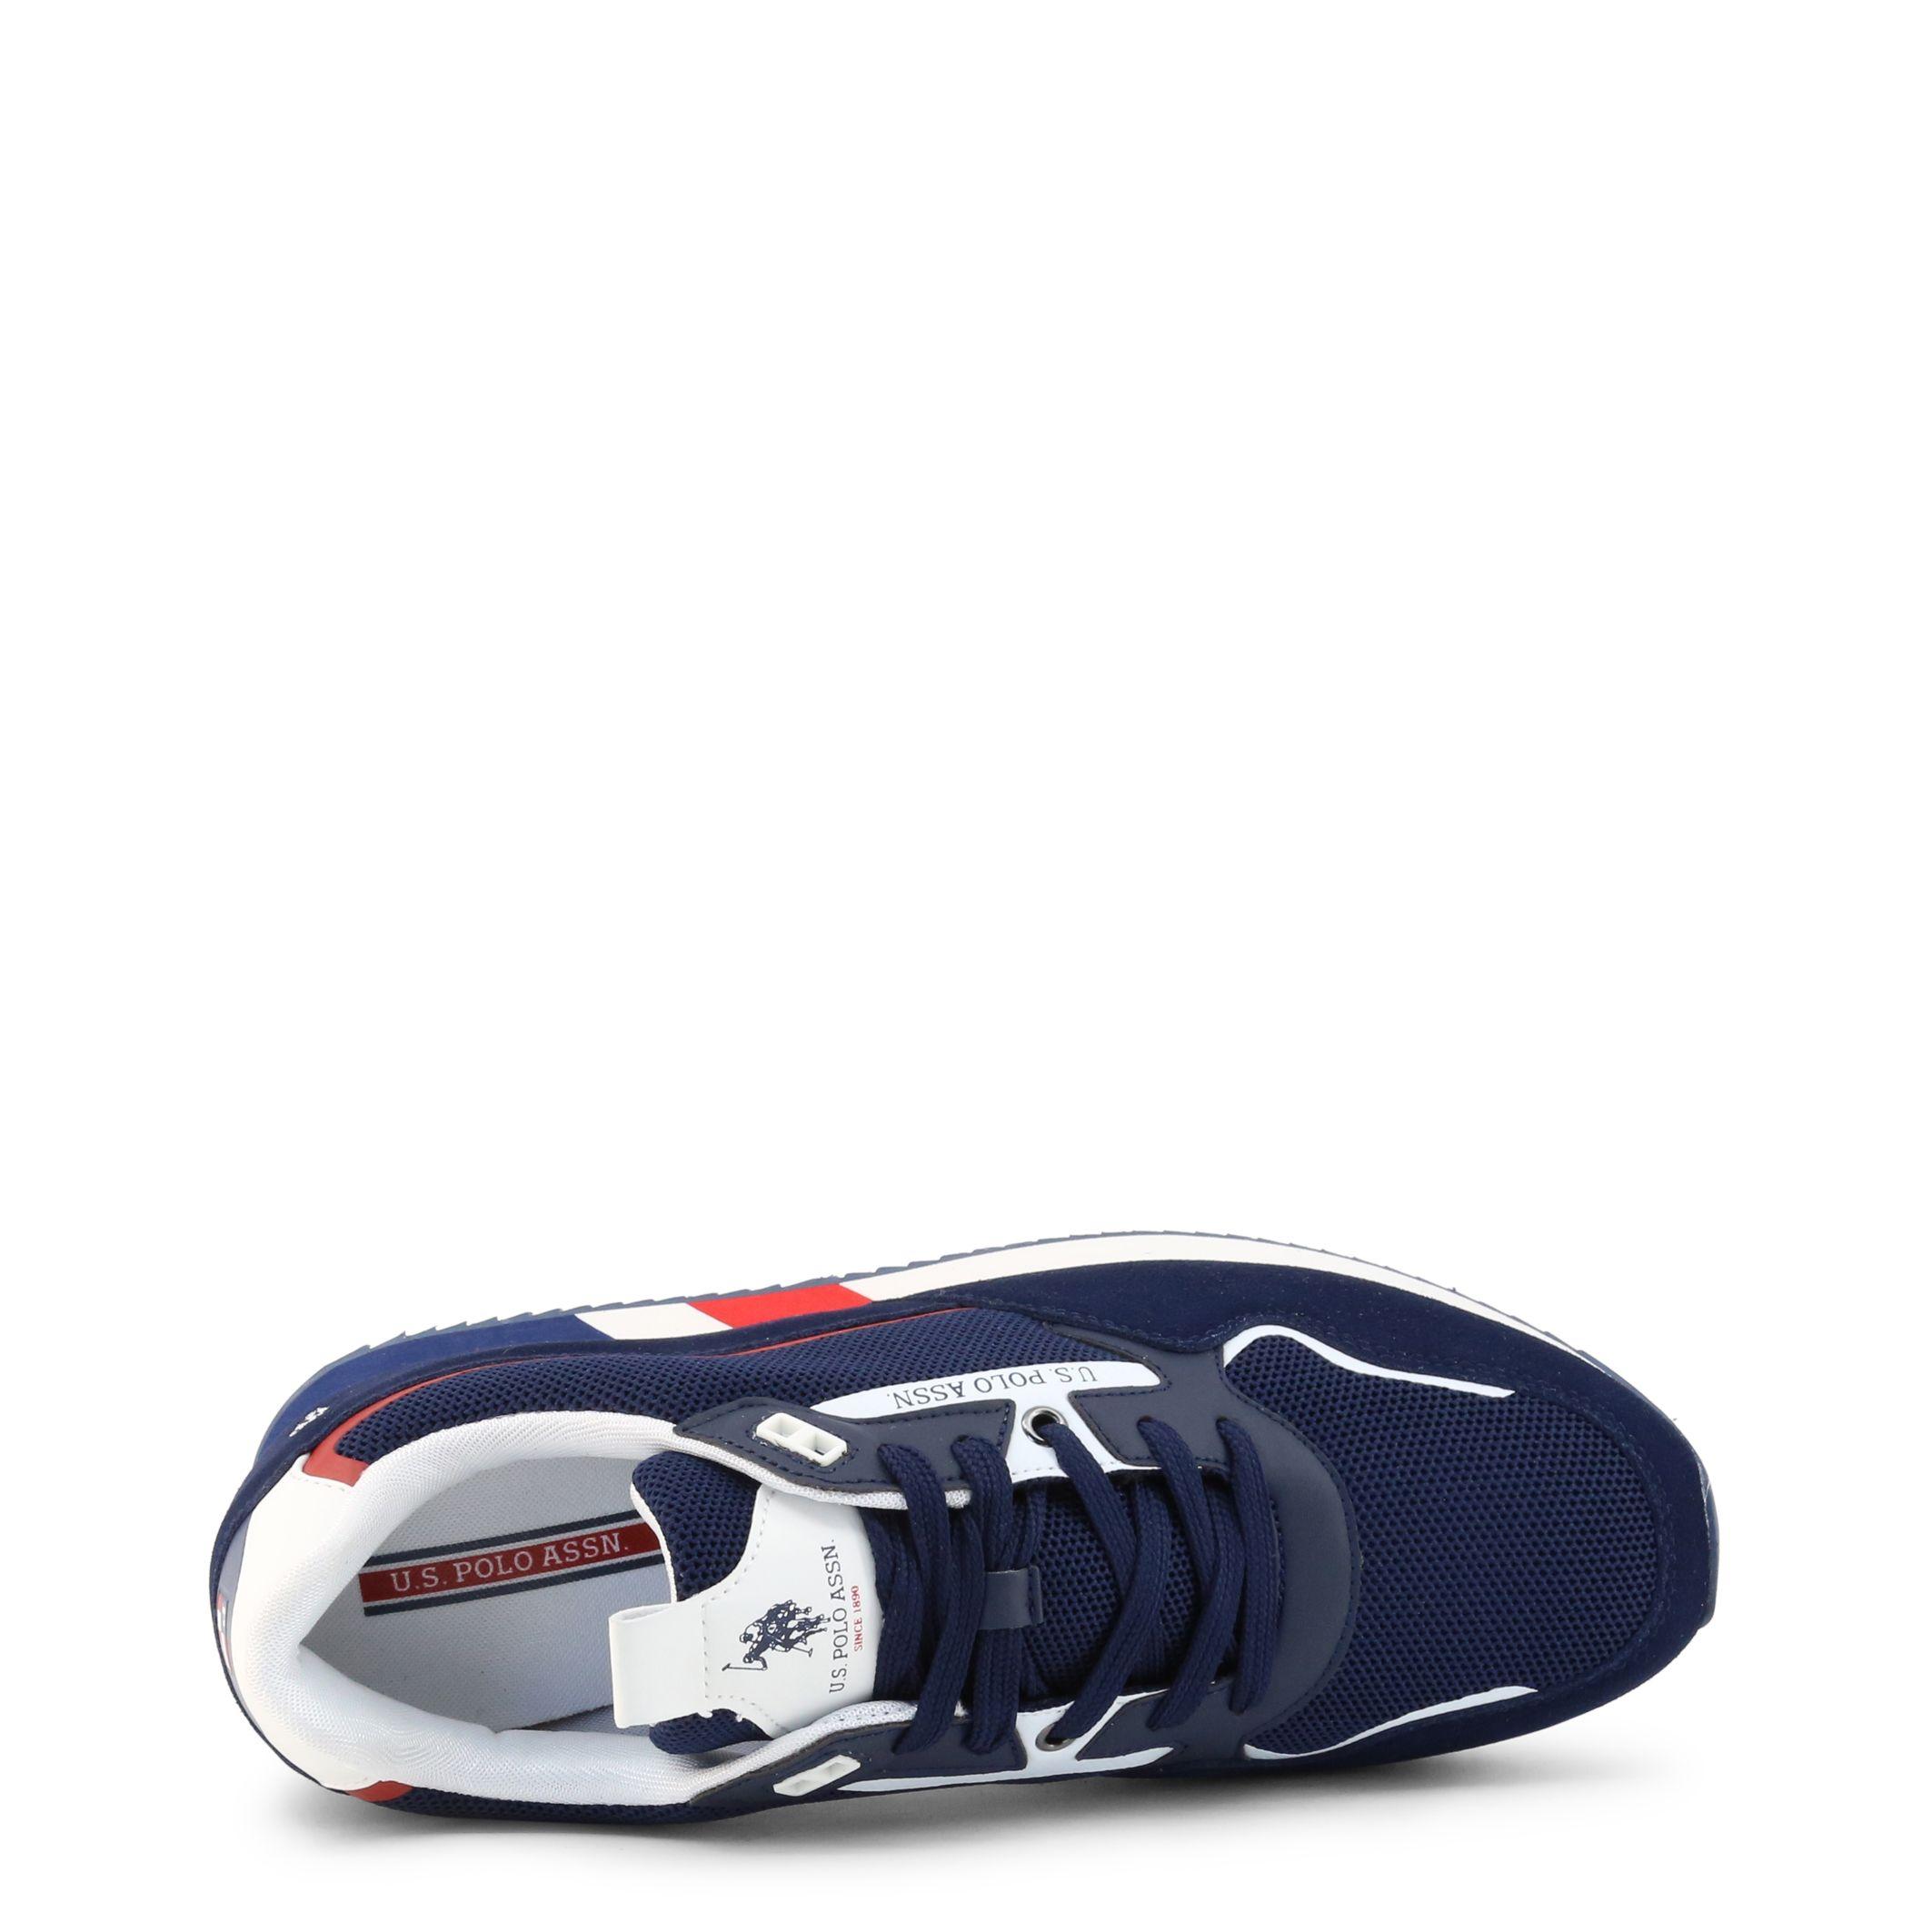 U.S. Polo Assn. - LEWIS4143S1_HM1   You Fashion Outlet